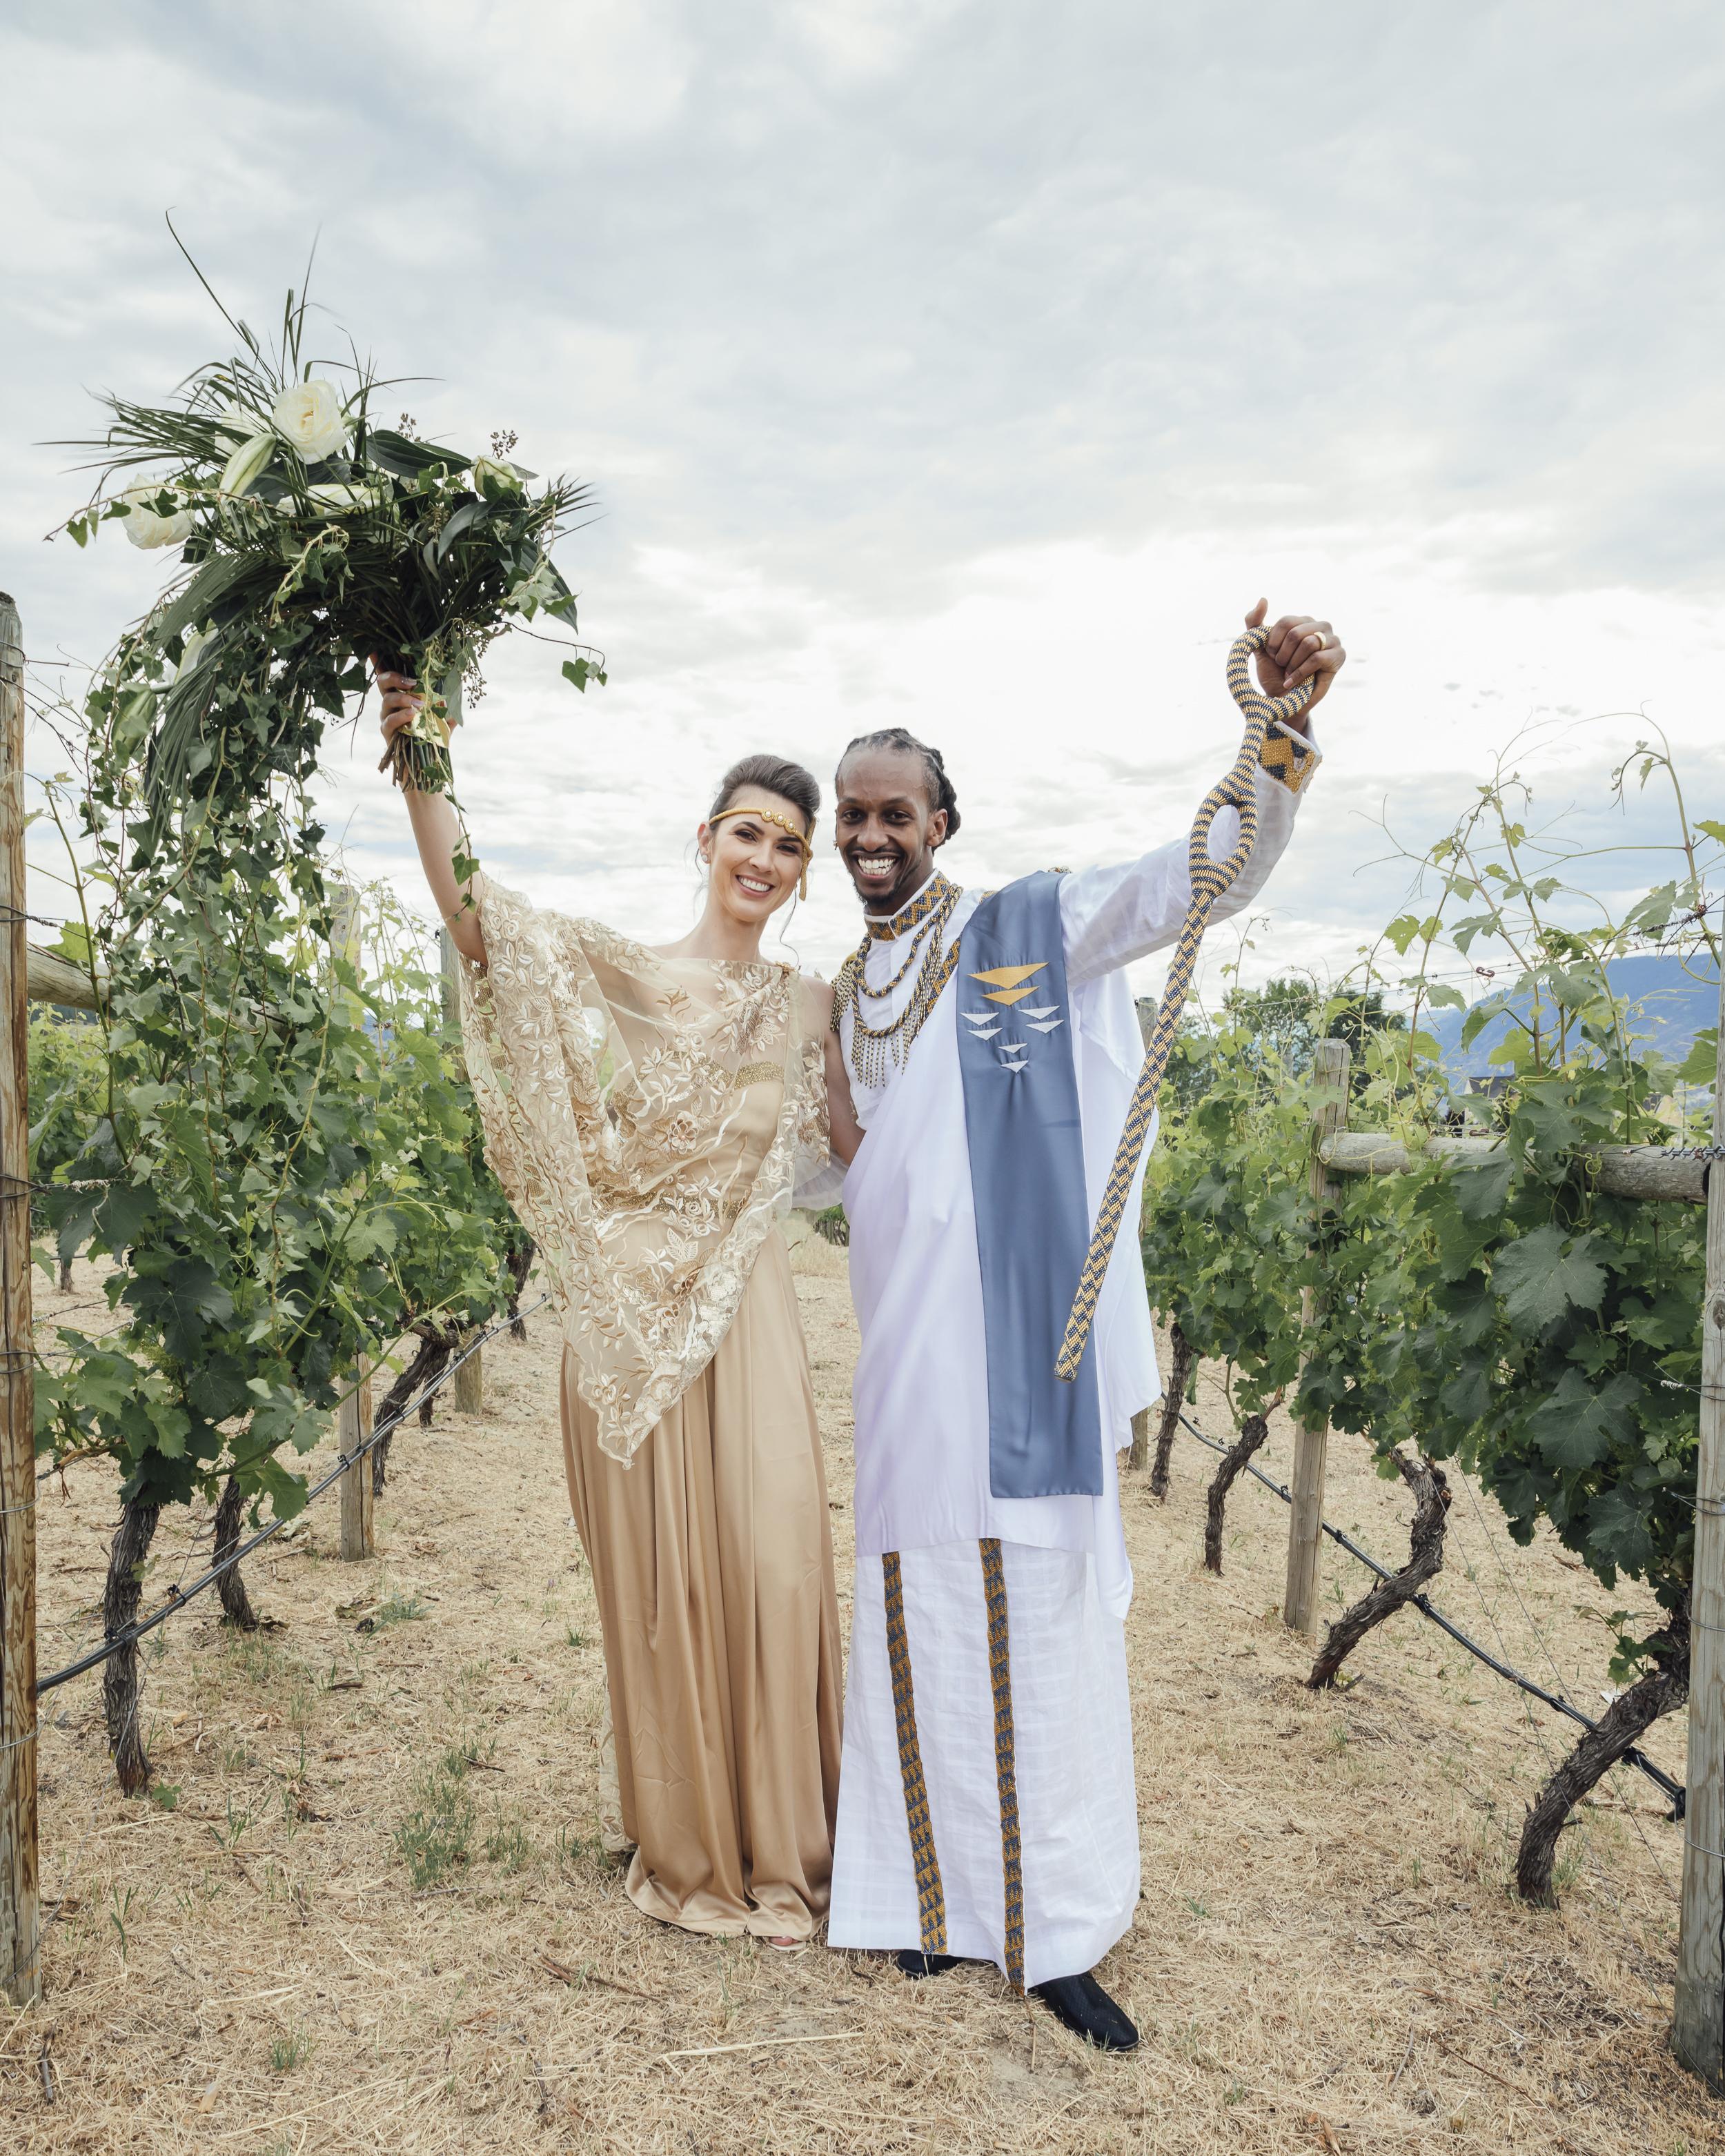 Three Sisters Winery - Penticton, BC Wedding